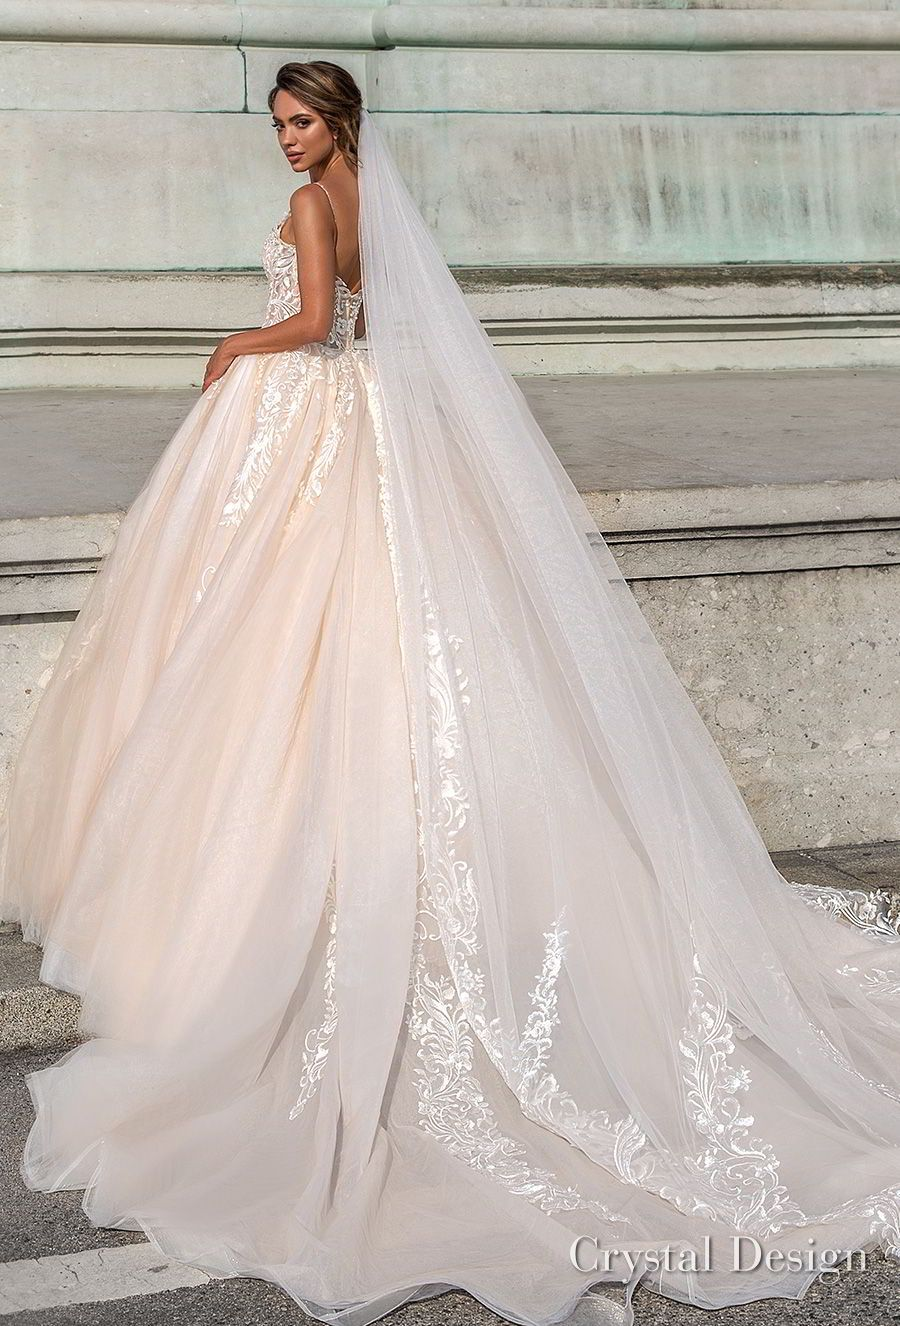 Ball gowns wedding dresses  Crystal Design  Wedding Dresses u ucRoyal Gardenud u Haute Couture